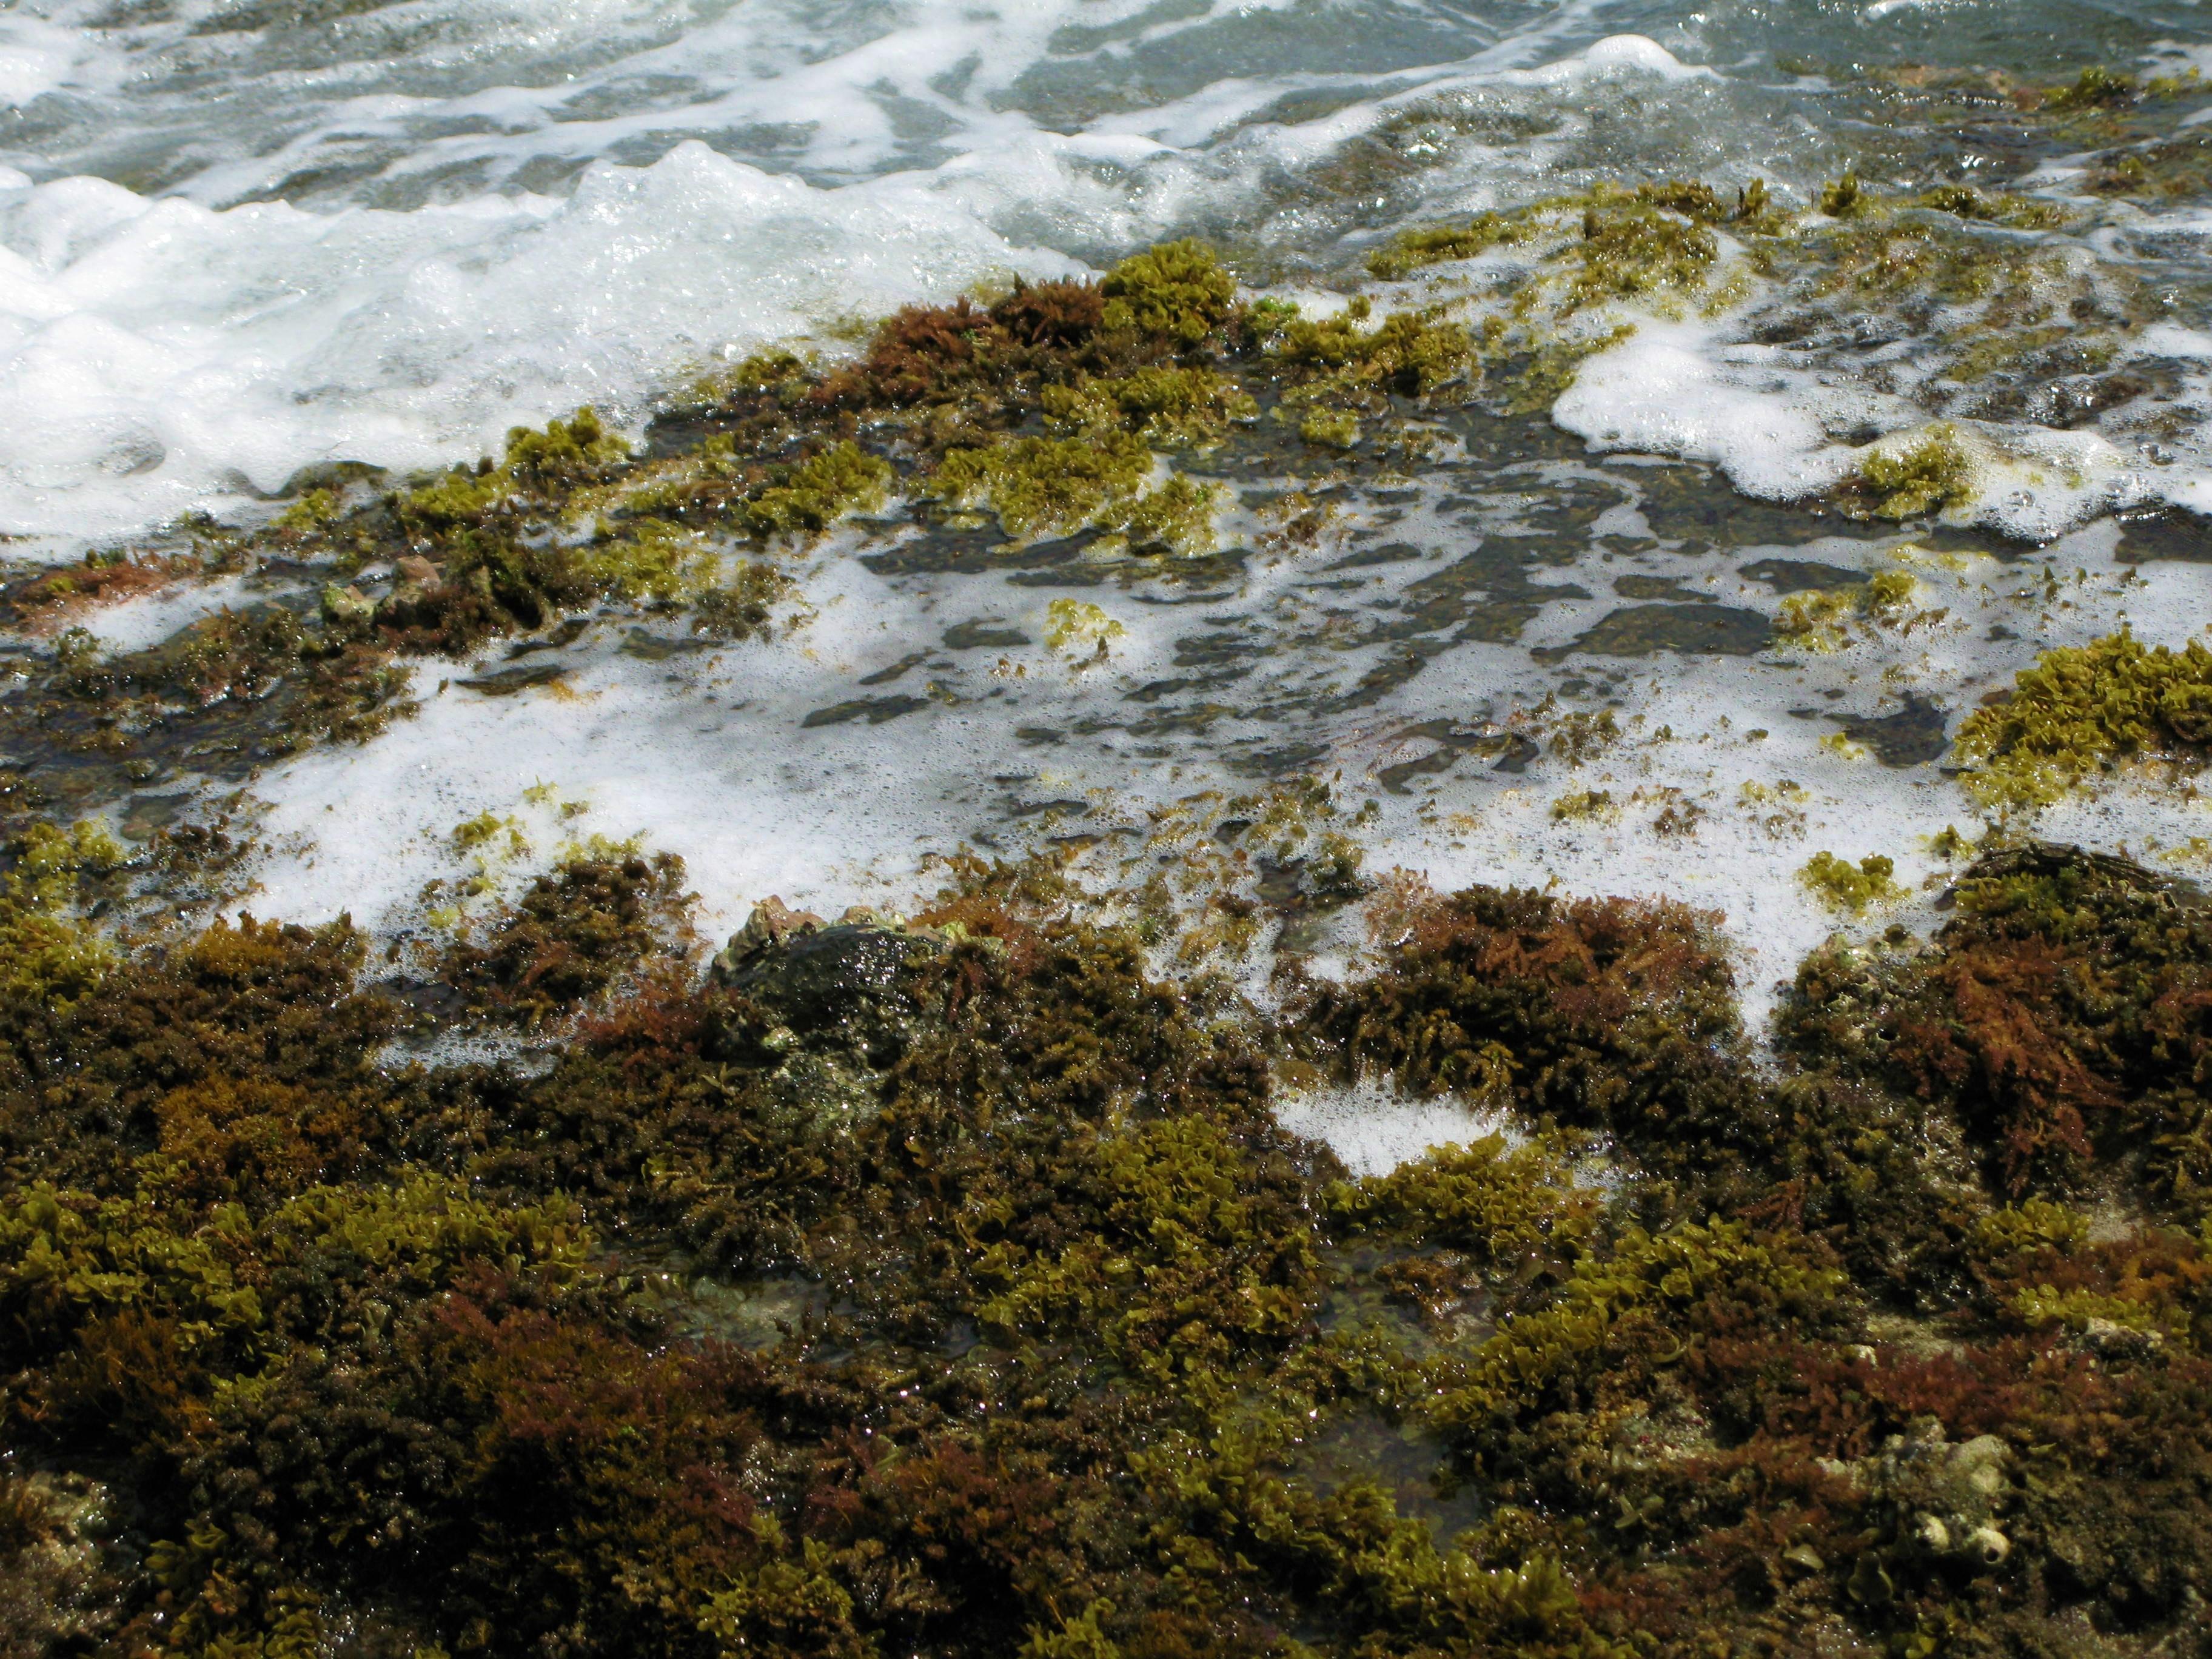 discovering marine life